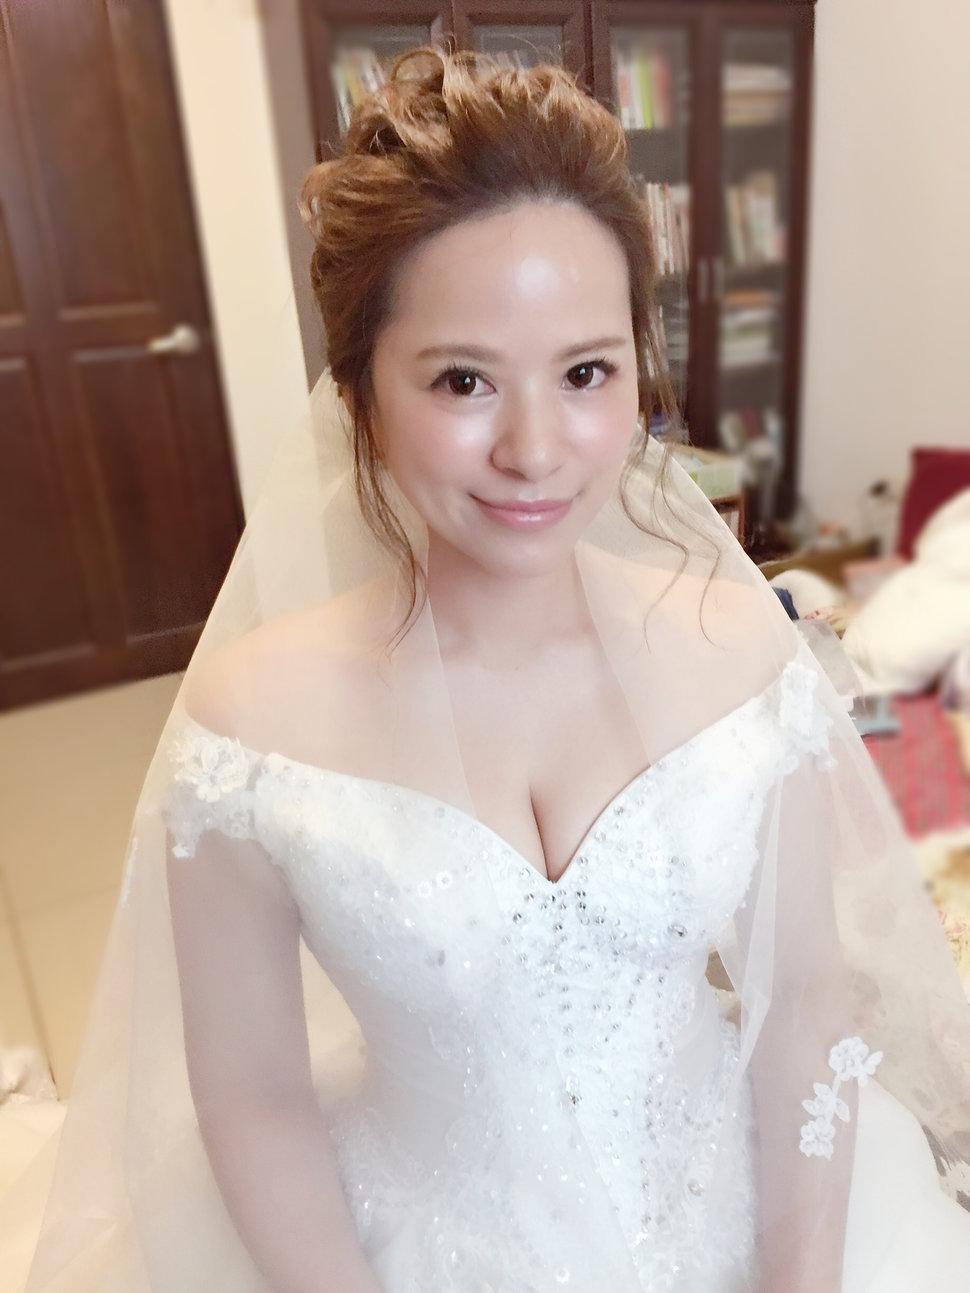 IMG_8583 - 幫您bonnie make up《結婚吧》